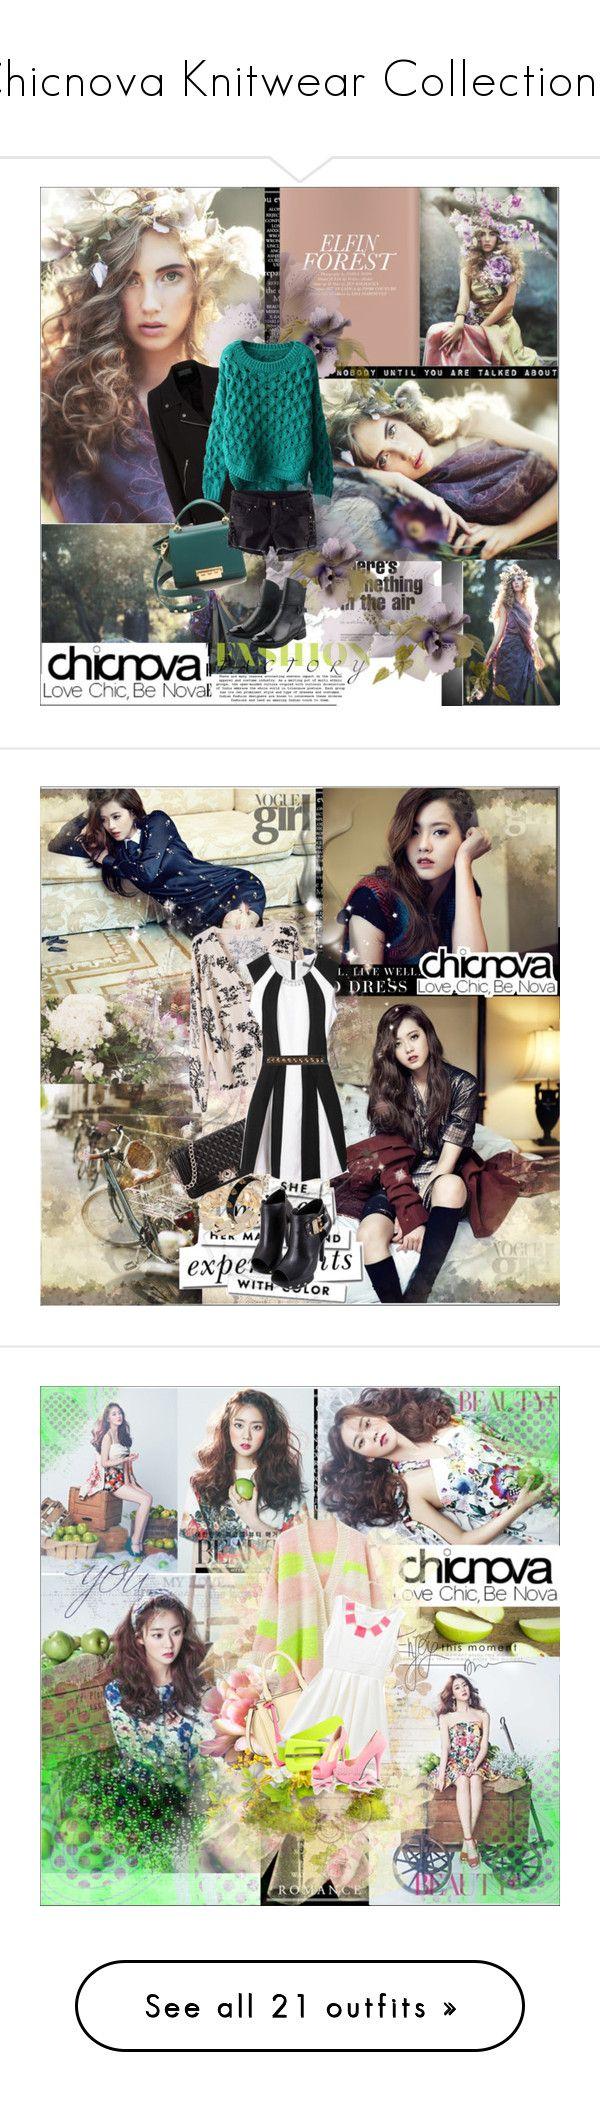 """Chicnova Knitwear Collection!!!"" by vidutoria ❤ liked on Polyvore featuring ZAC Zac Posen, Levi's, Kate Spade, vintage, Mavi, Louis Vuitton, Hermès, PLANT, MCM and Benjamin Moore"